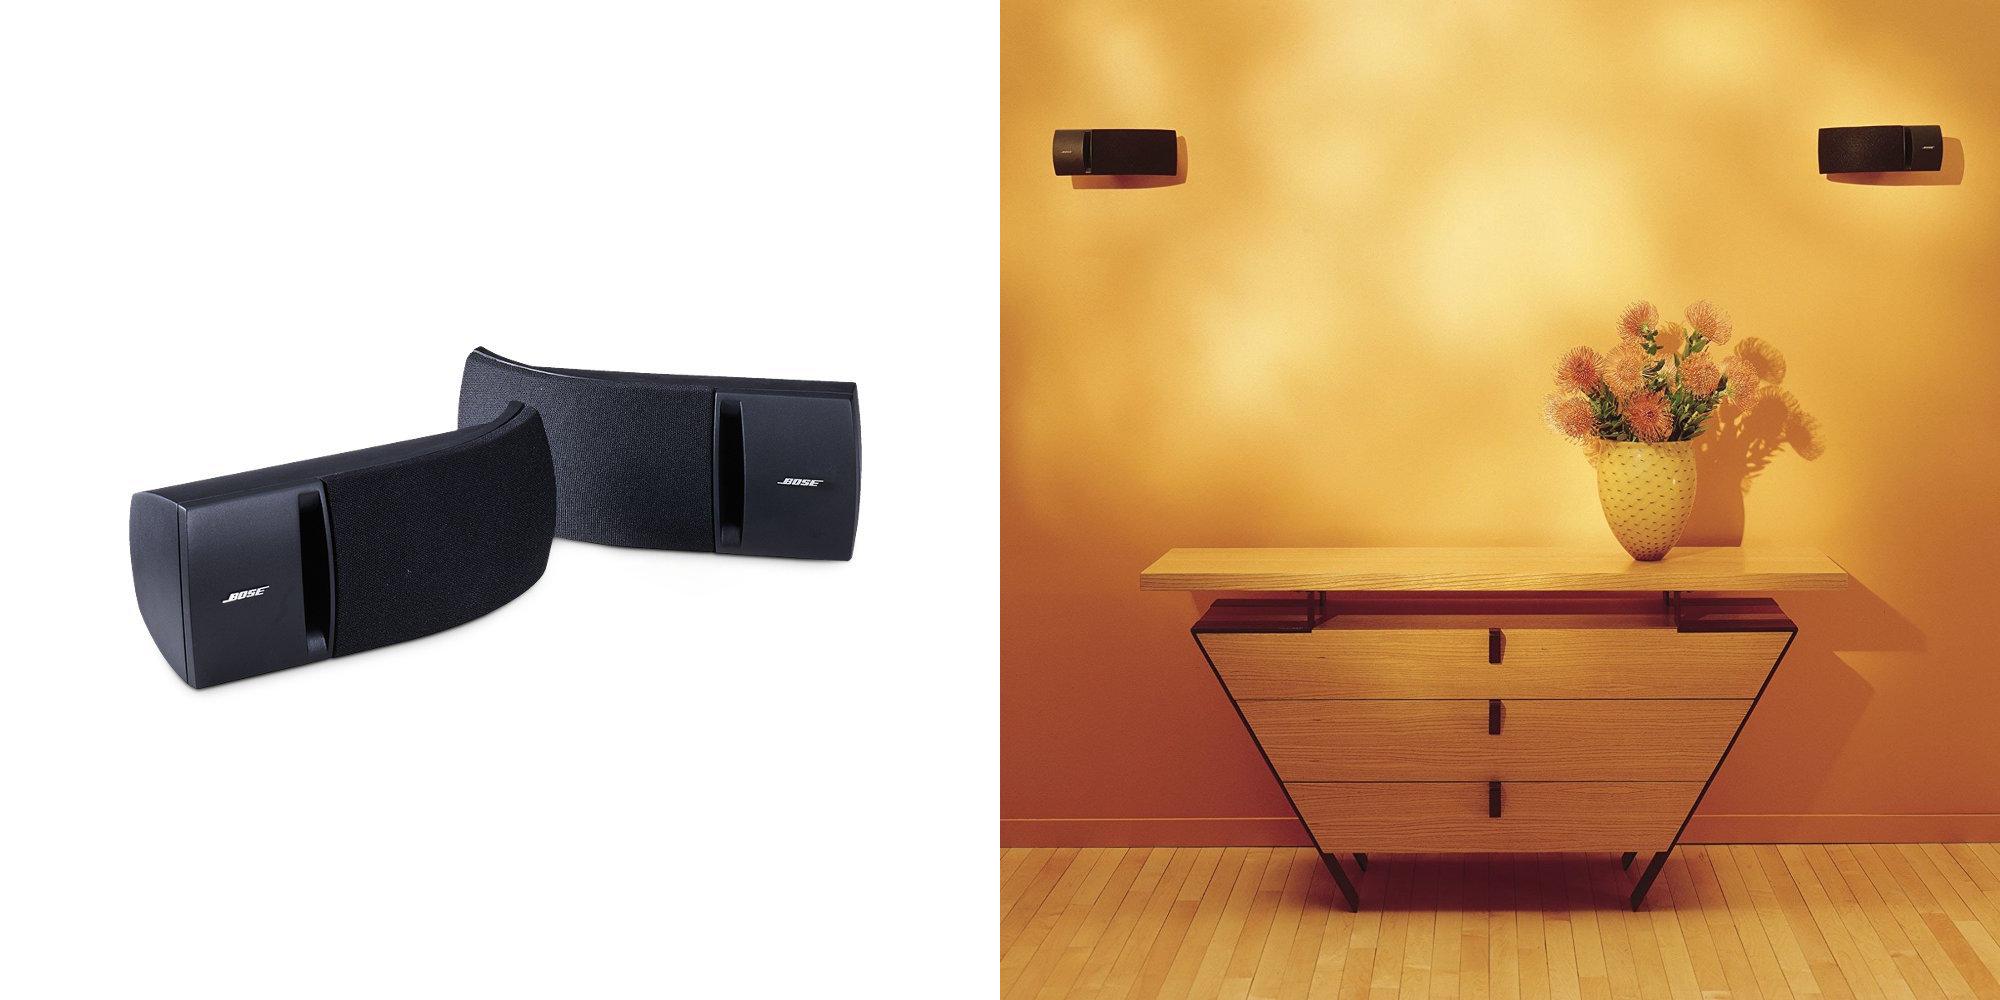 Bose Bookshelf Speakers Drop To All Time Low Price Of Refurb Orig Jpg 1600x800 161